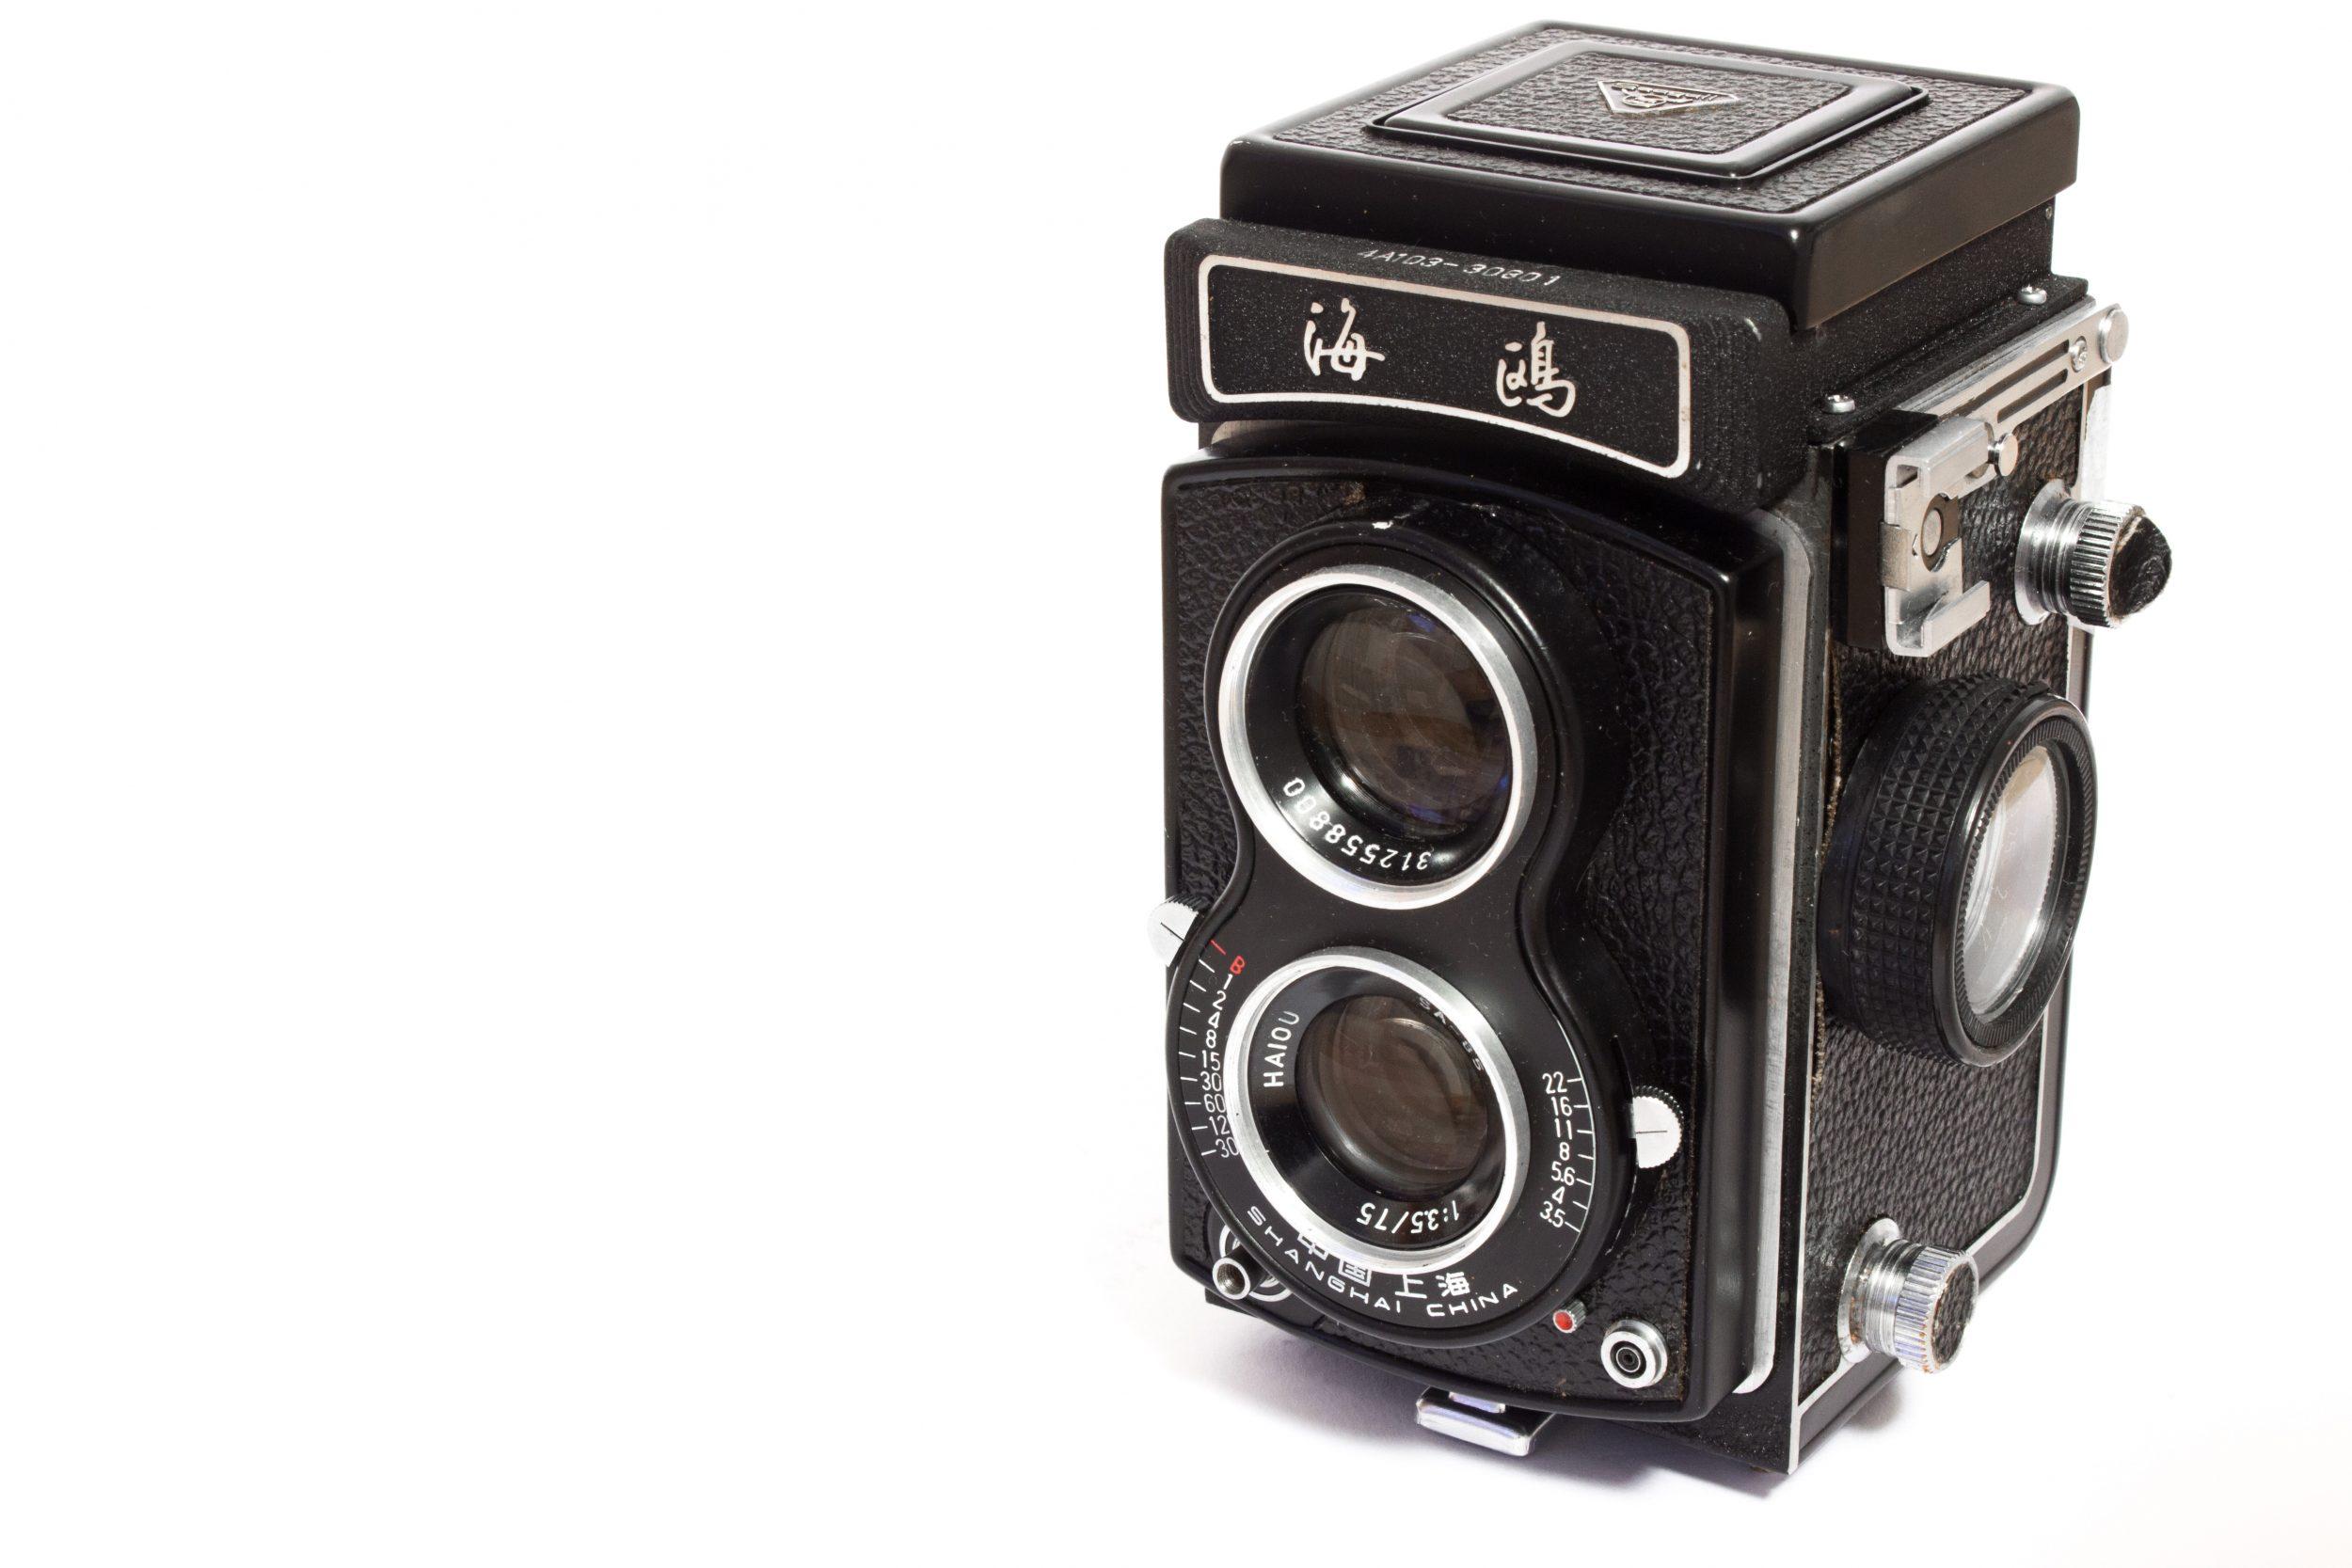 Seagull-4A camera (Pic: FlanellKamerasFilm/Wikimedia Commons)